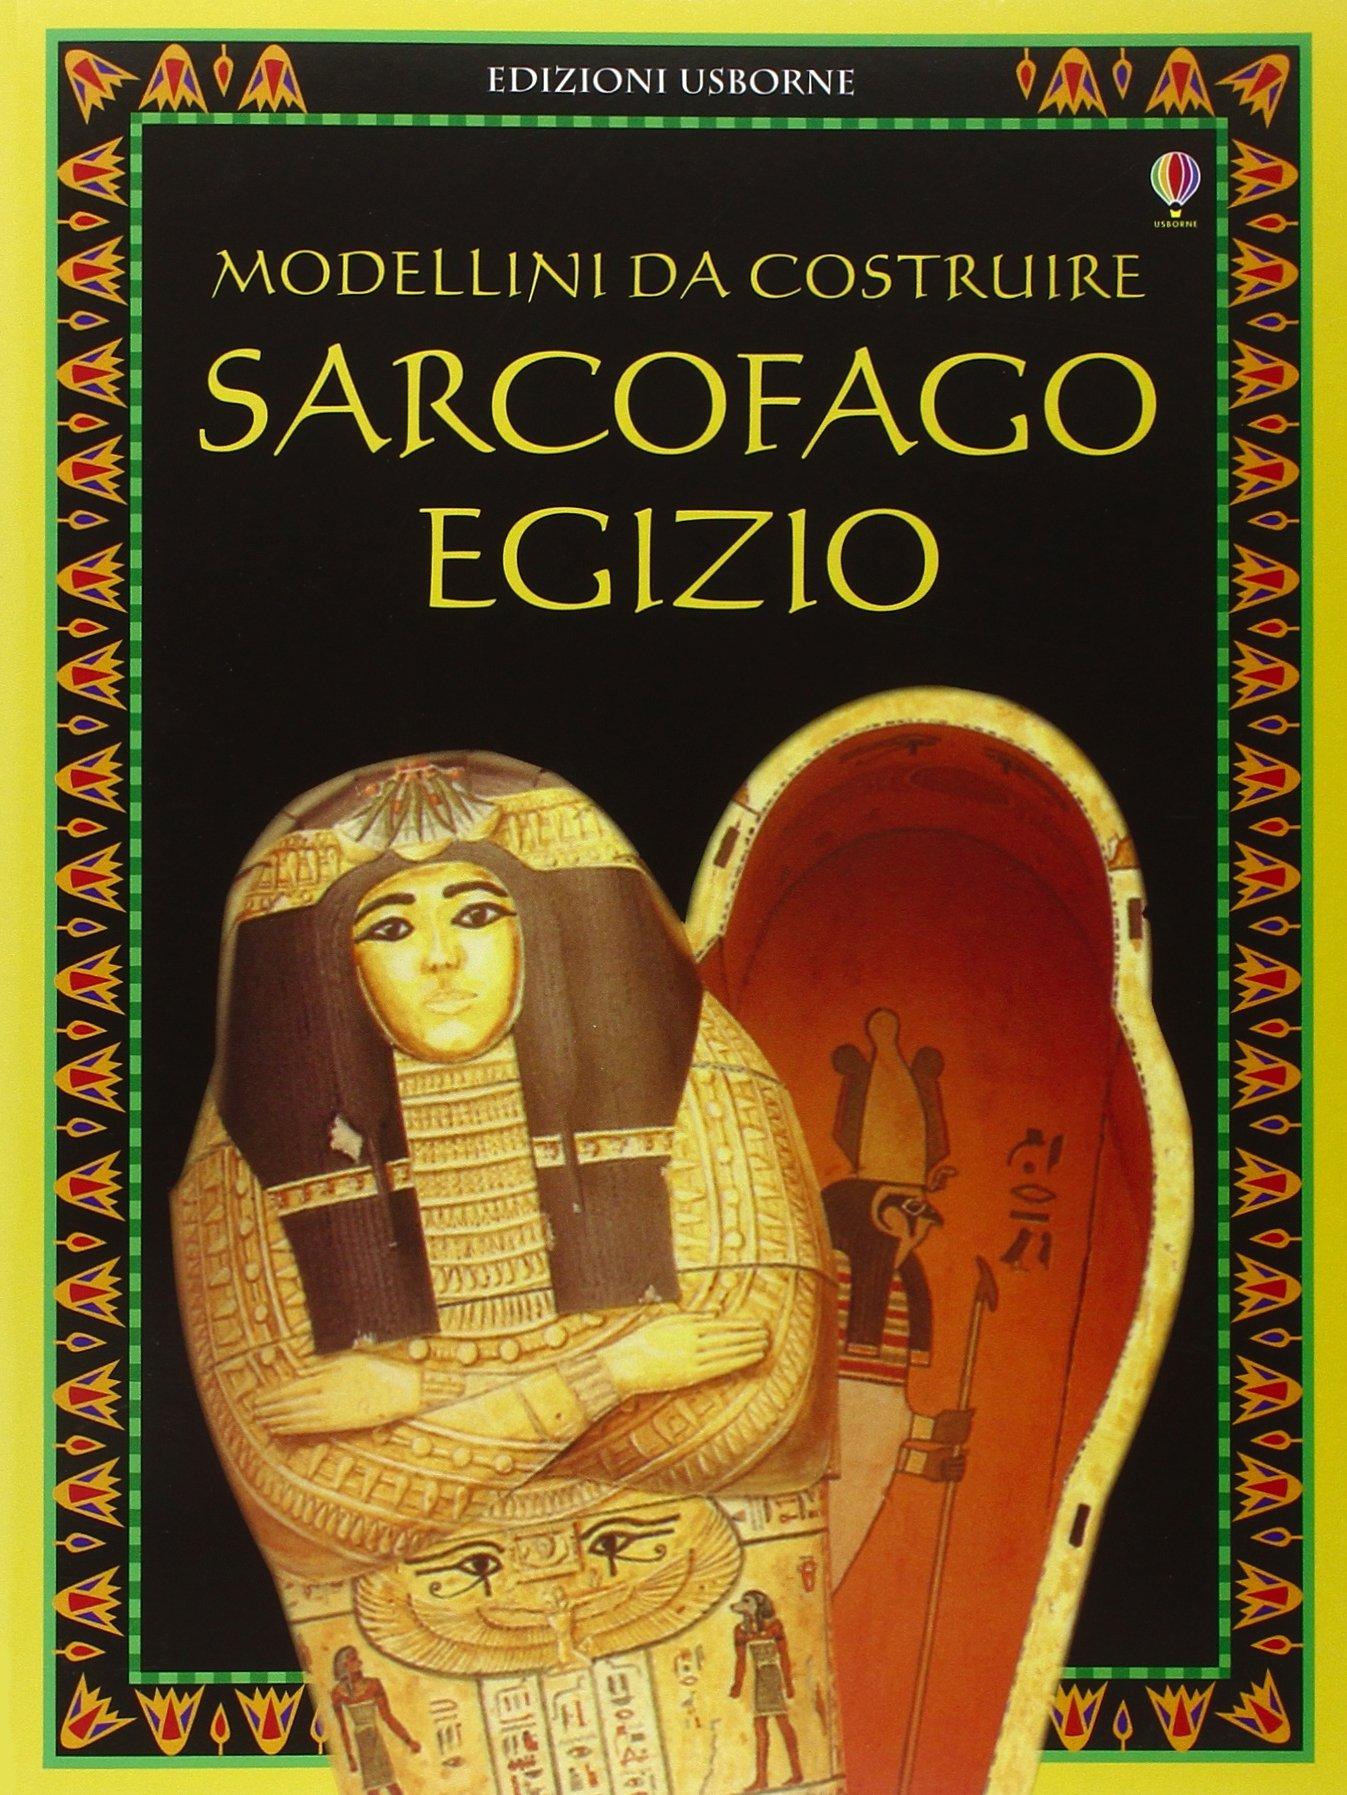 Sarcofago egizio. Modellini da costruire. Ediz. illustrata (Costruisci)